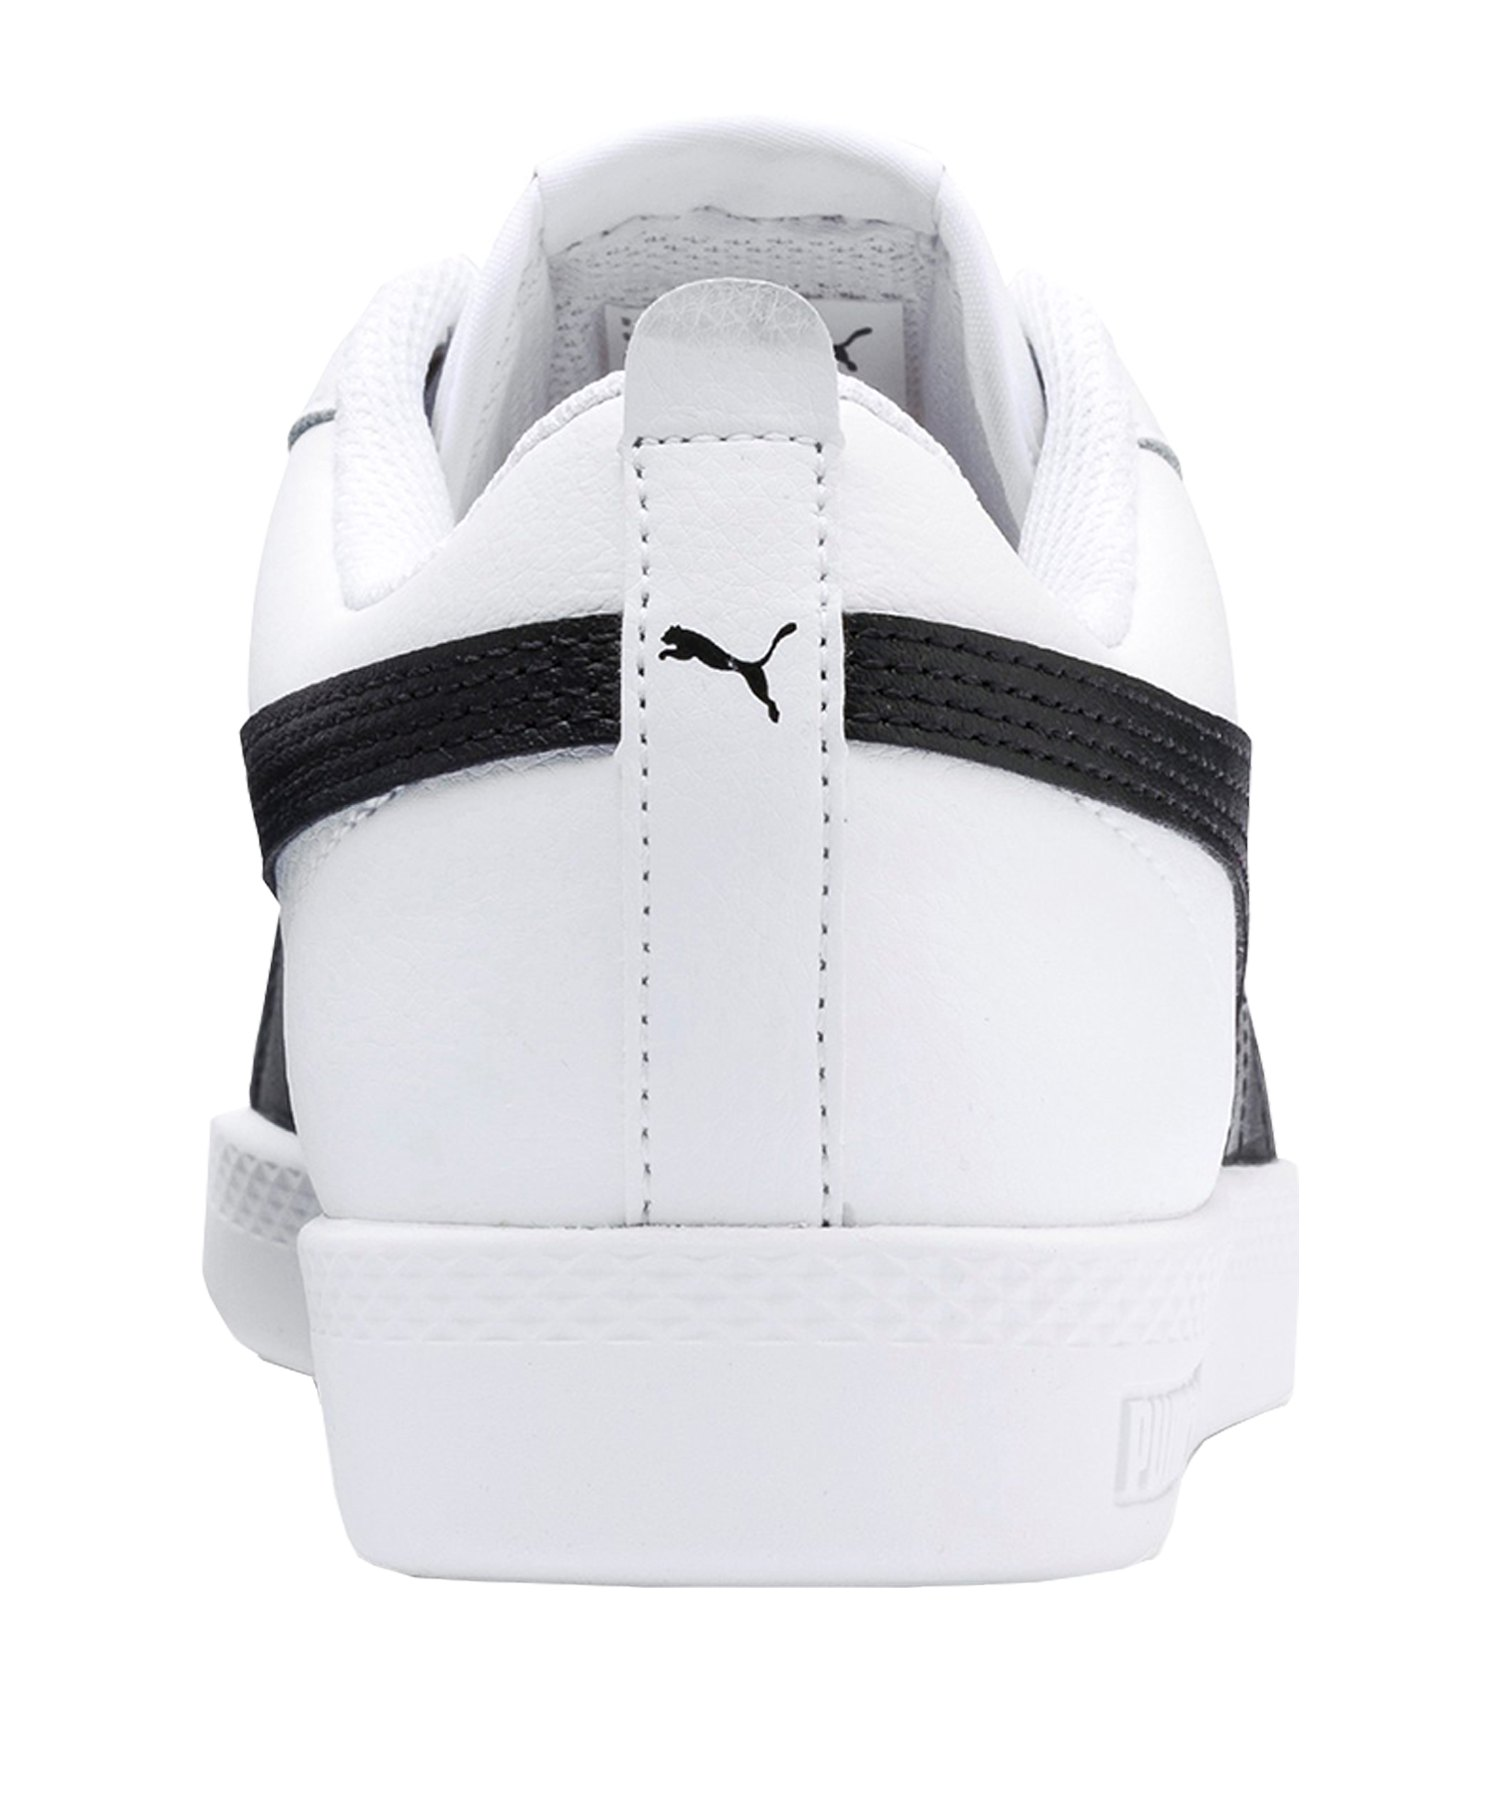 F01 V2 Damen Weiss F3ut1jlck5 L Sneaker Puma Smash 6fy7gbvY